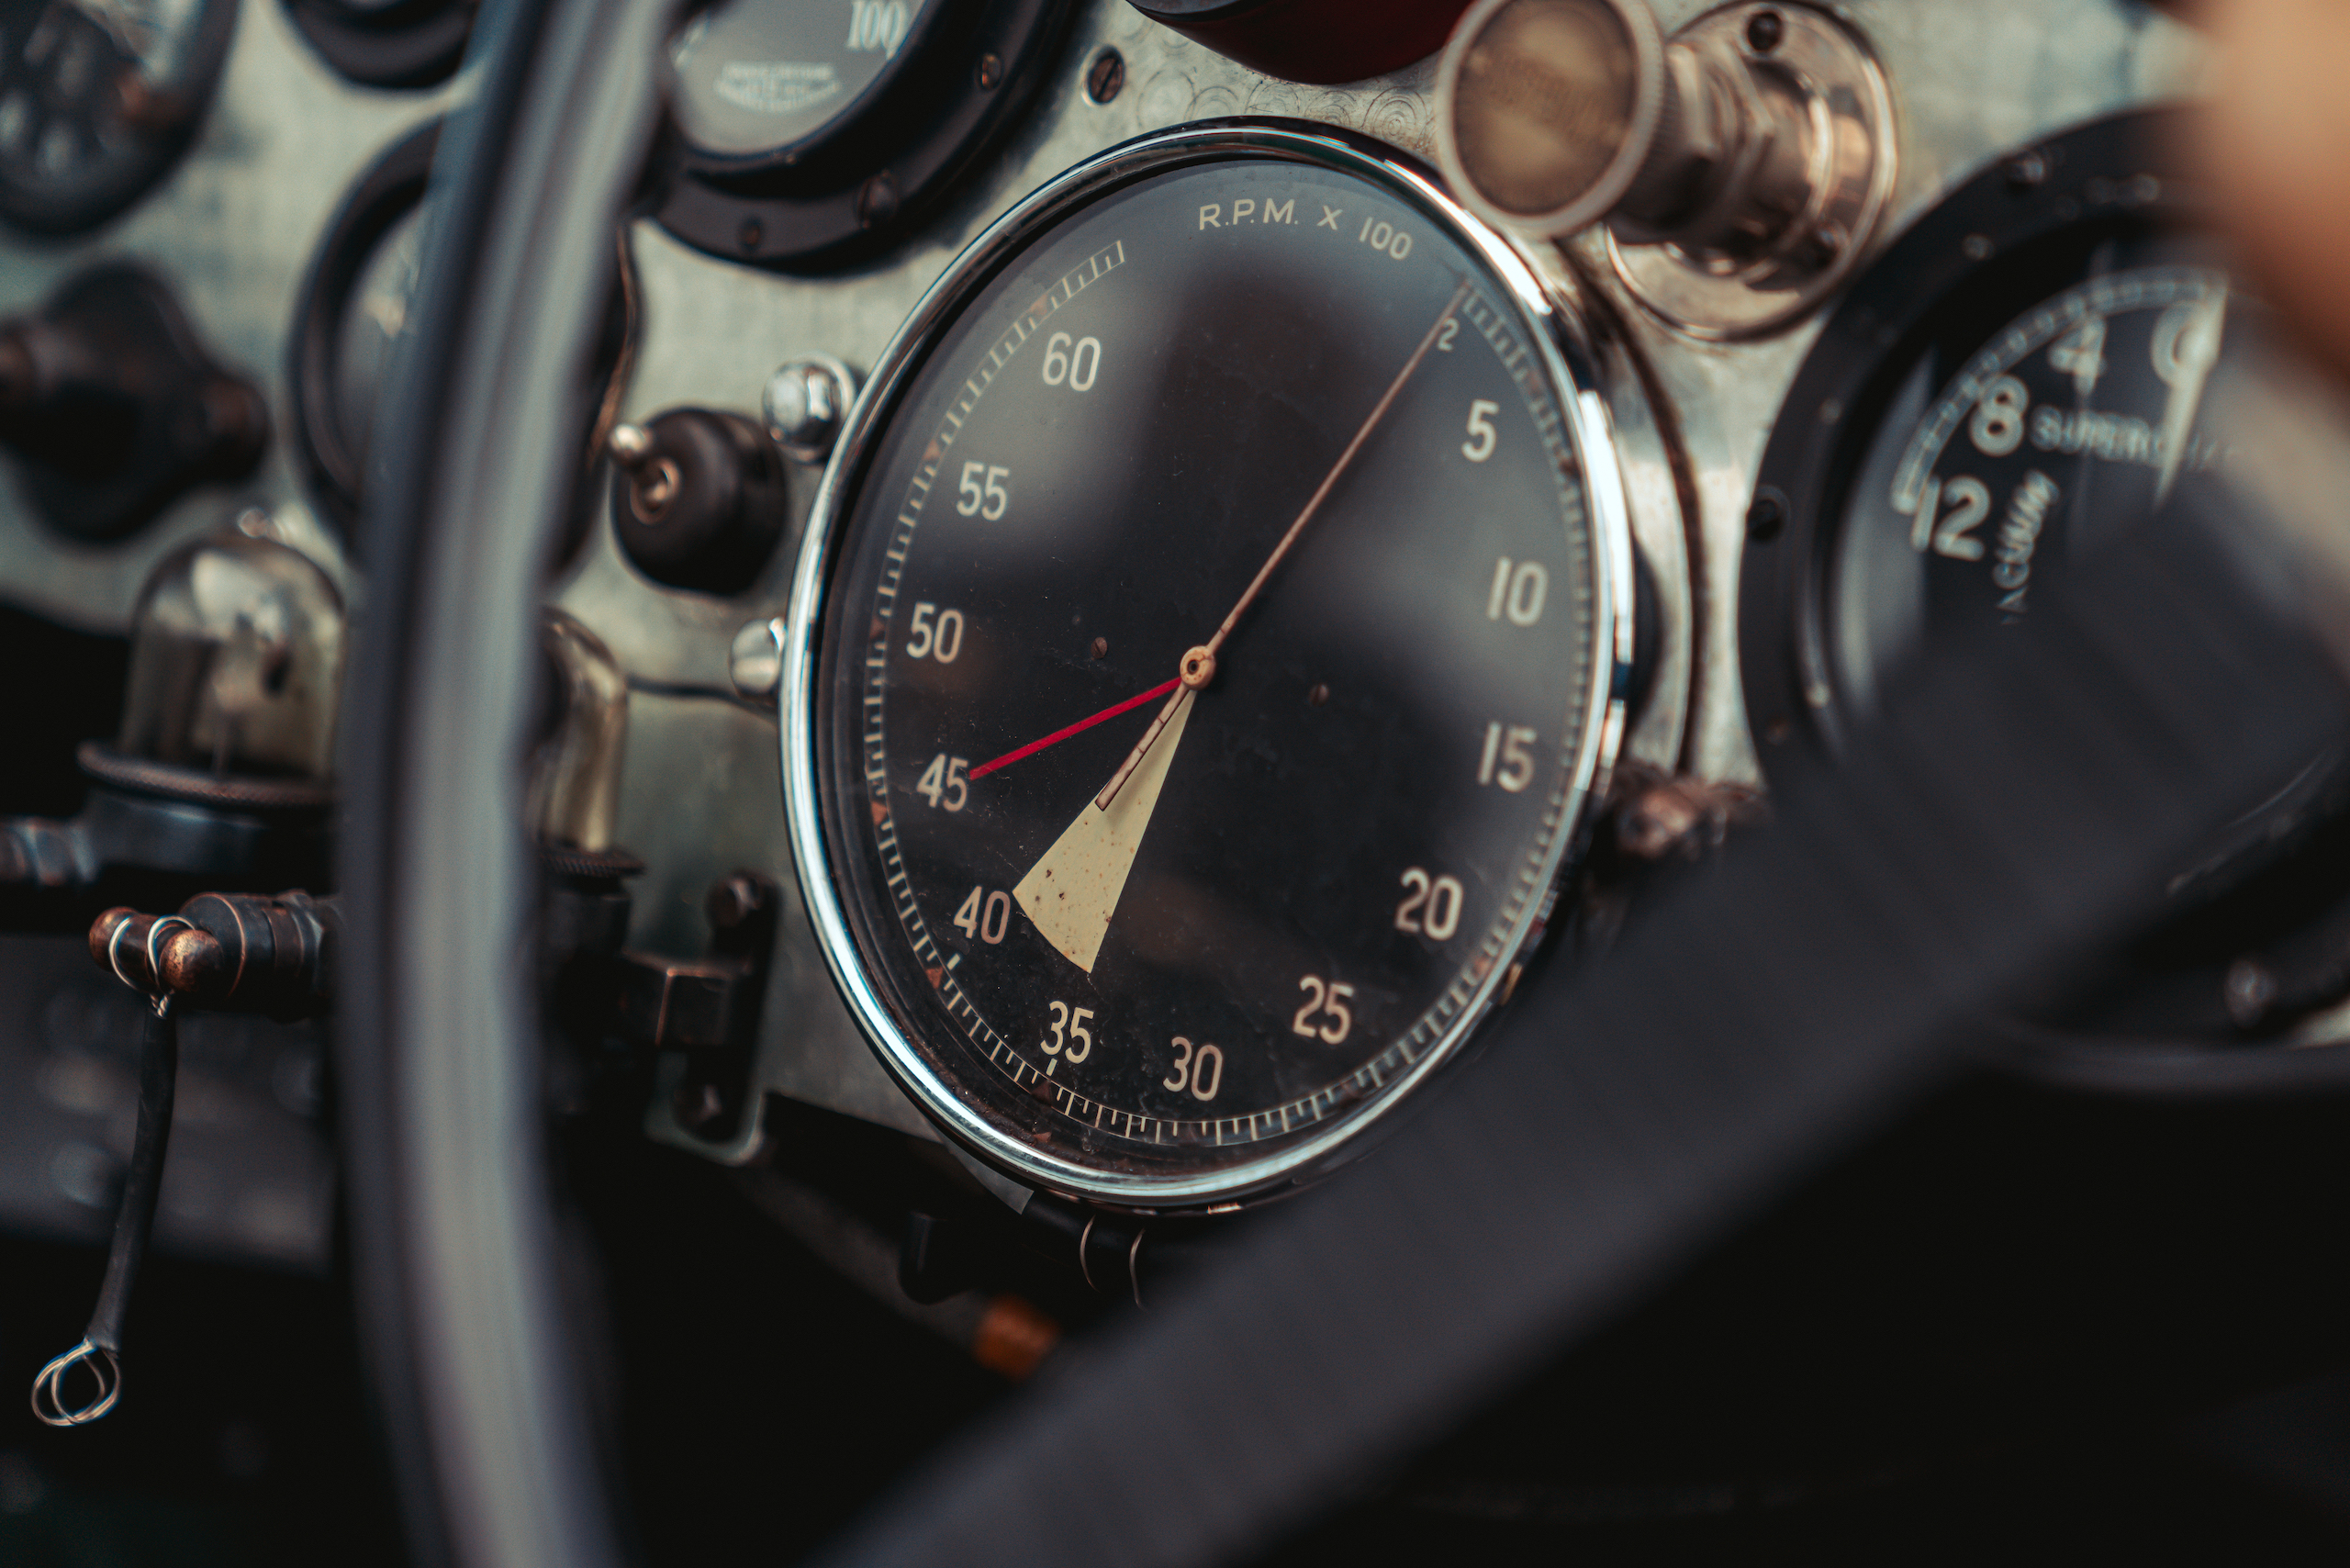 Blower Bentley rpm detail